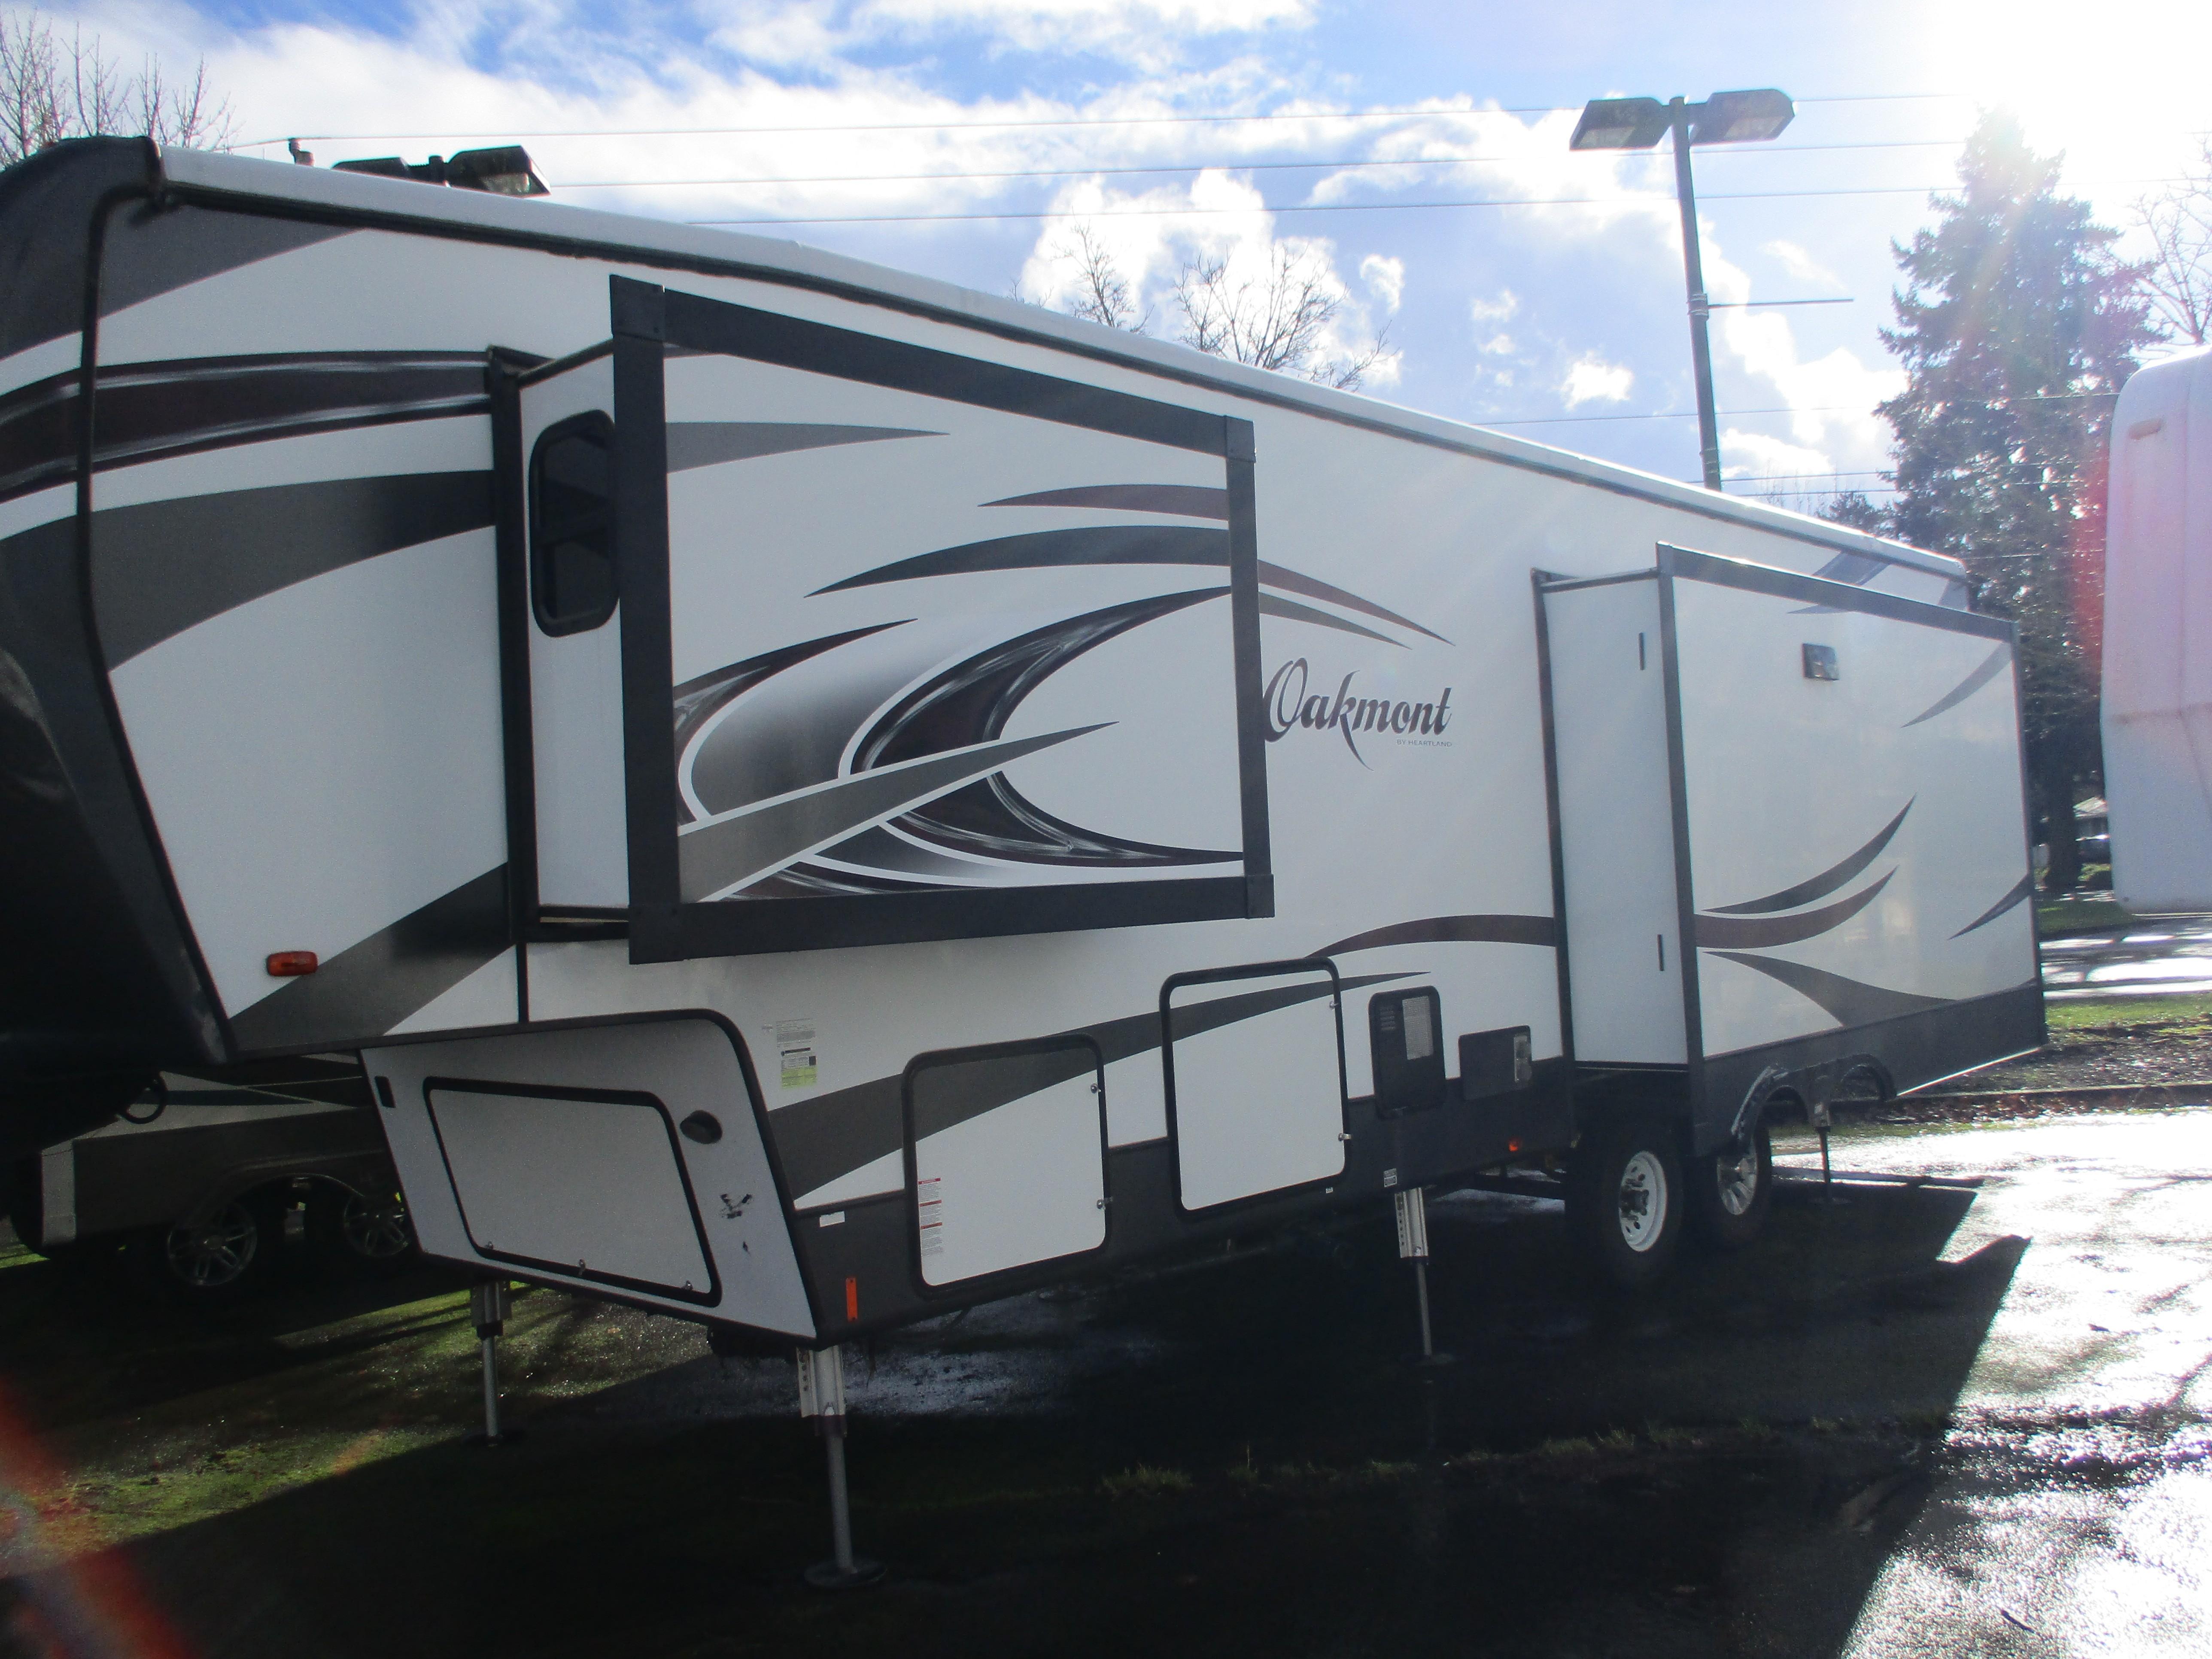 Used, 2017, Heartland, Oakmont OM 345 RS, Fifth Wheels